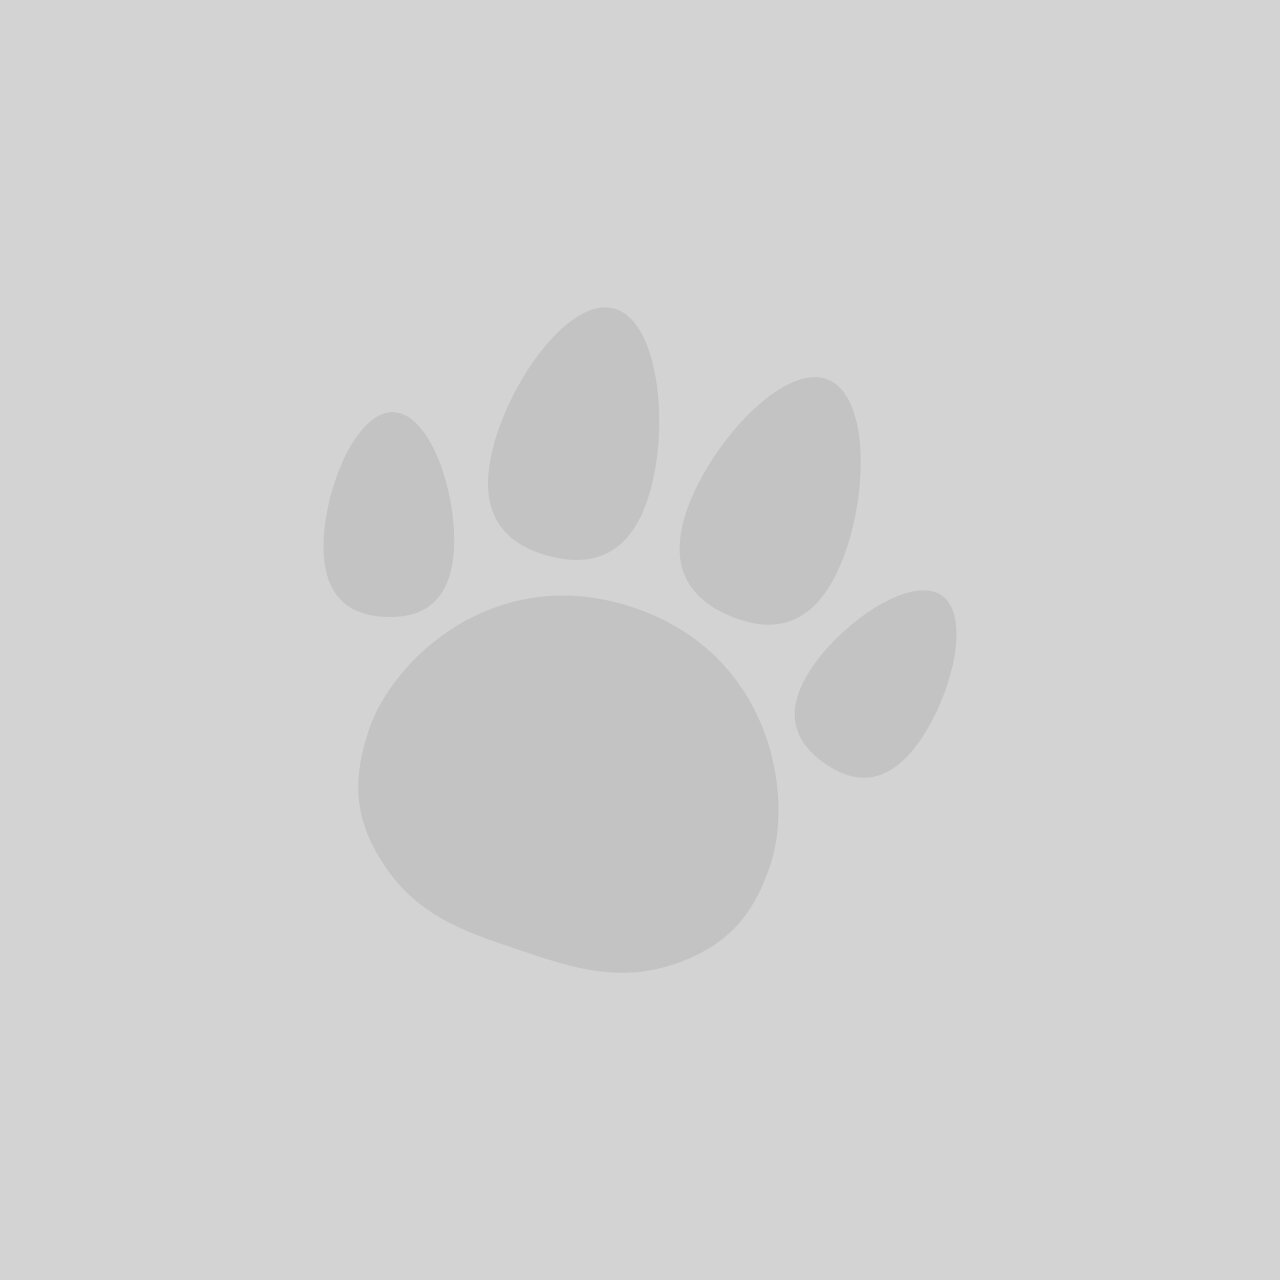 Flexi Classic Retractable Cord Medium Dog Lead 5m - Black